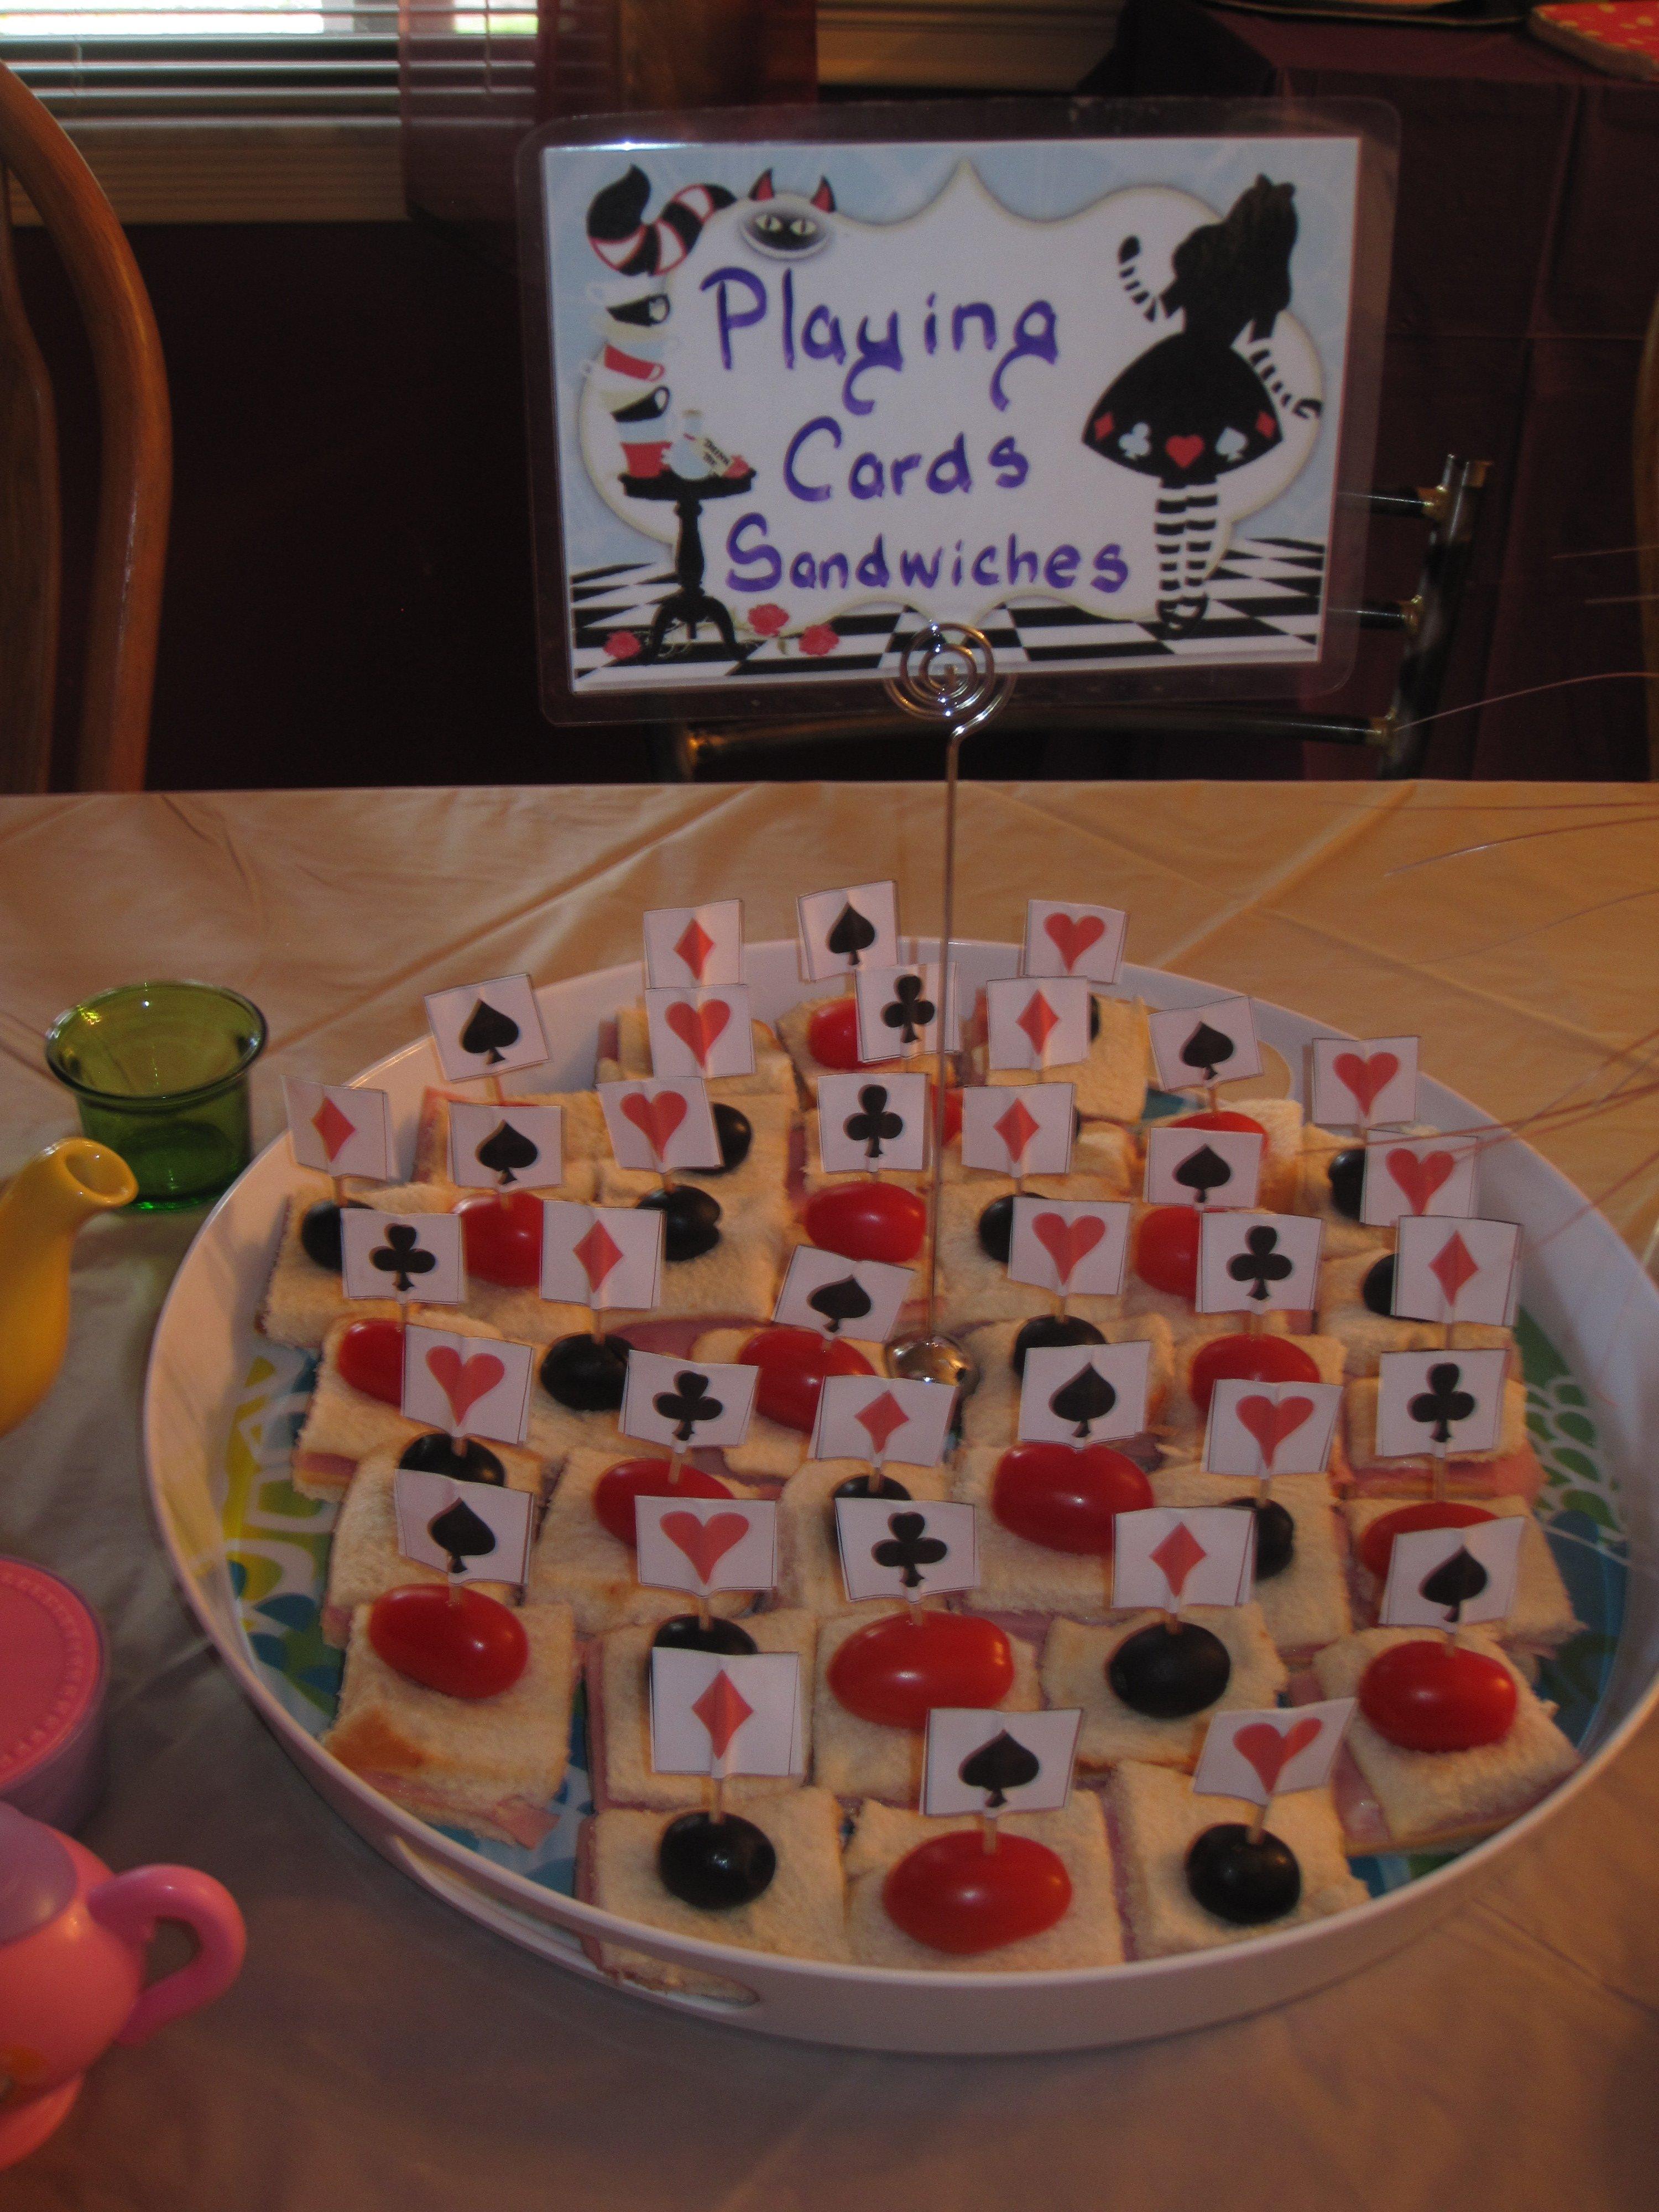 10 Elegant Alice In Wonderland Party Food Ideas azar alice in wonderland mad hatter tea party food alice in 1 2021